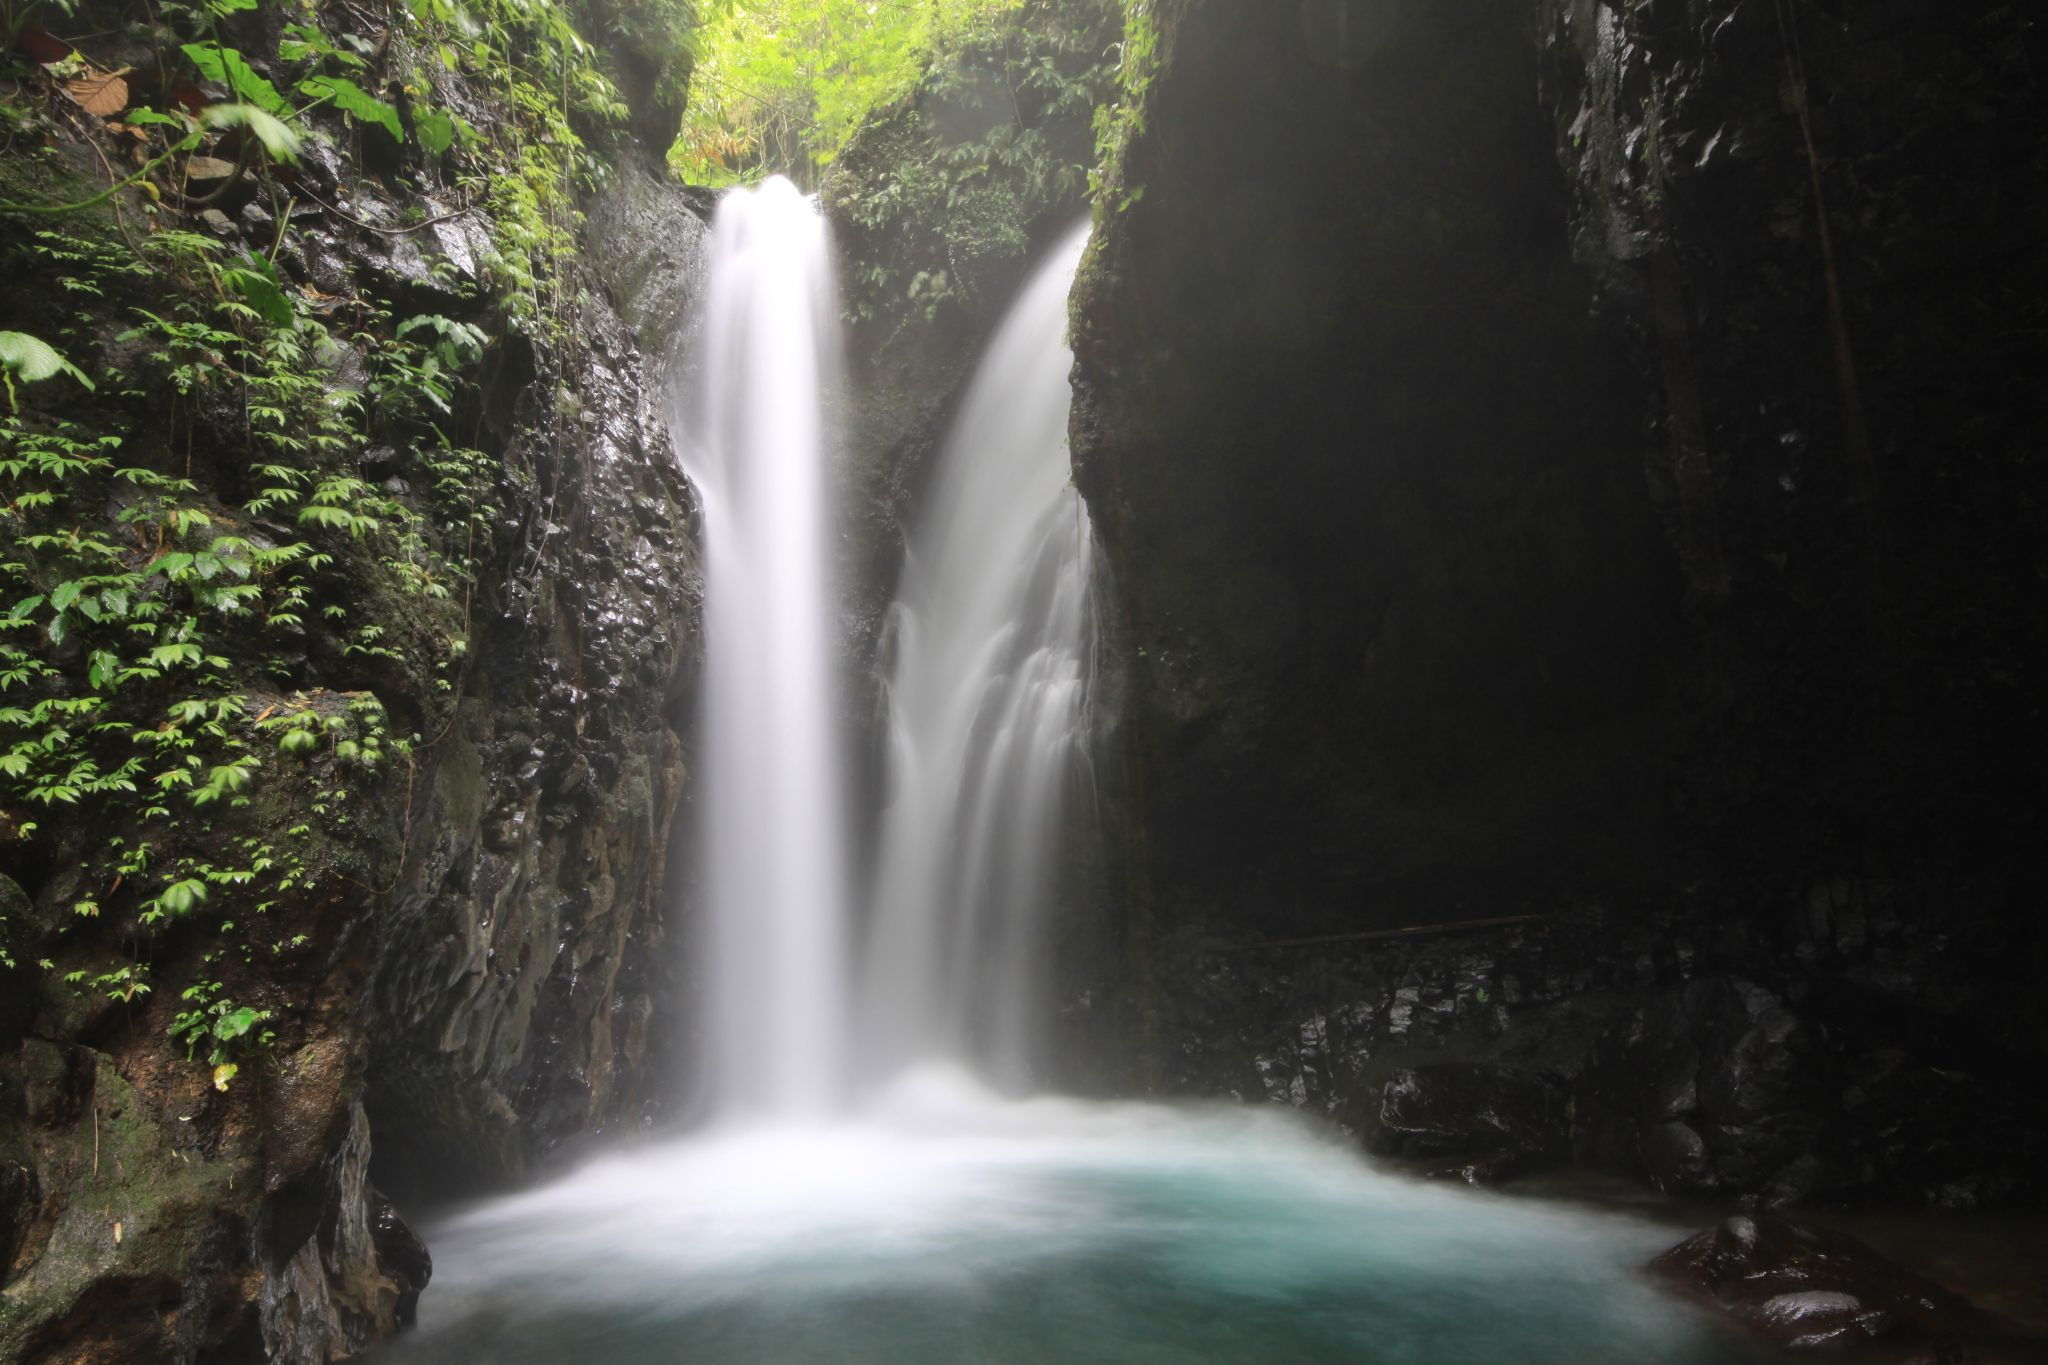 Gitgit waterfalls, Bali, Indonesia